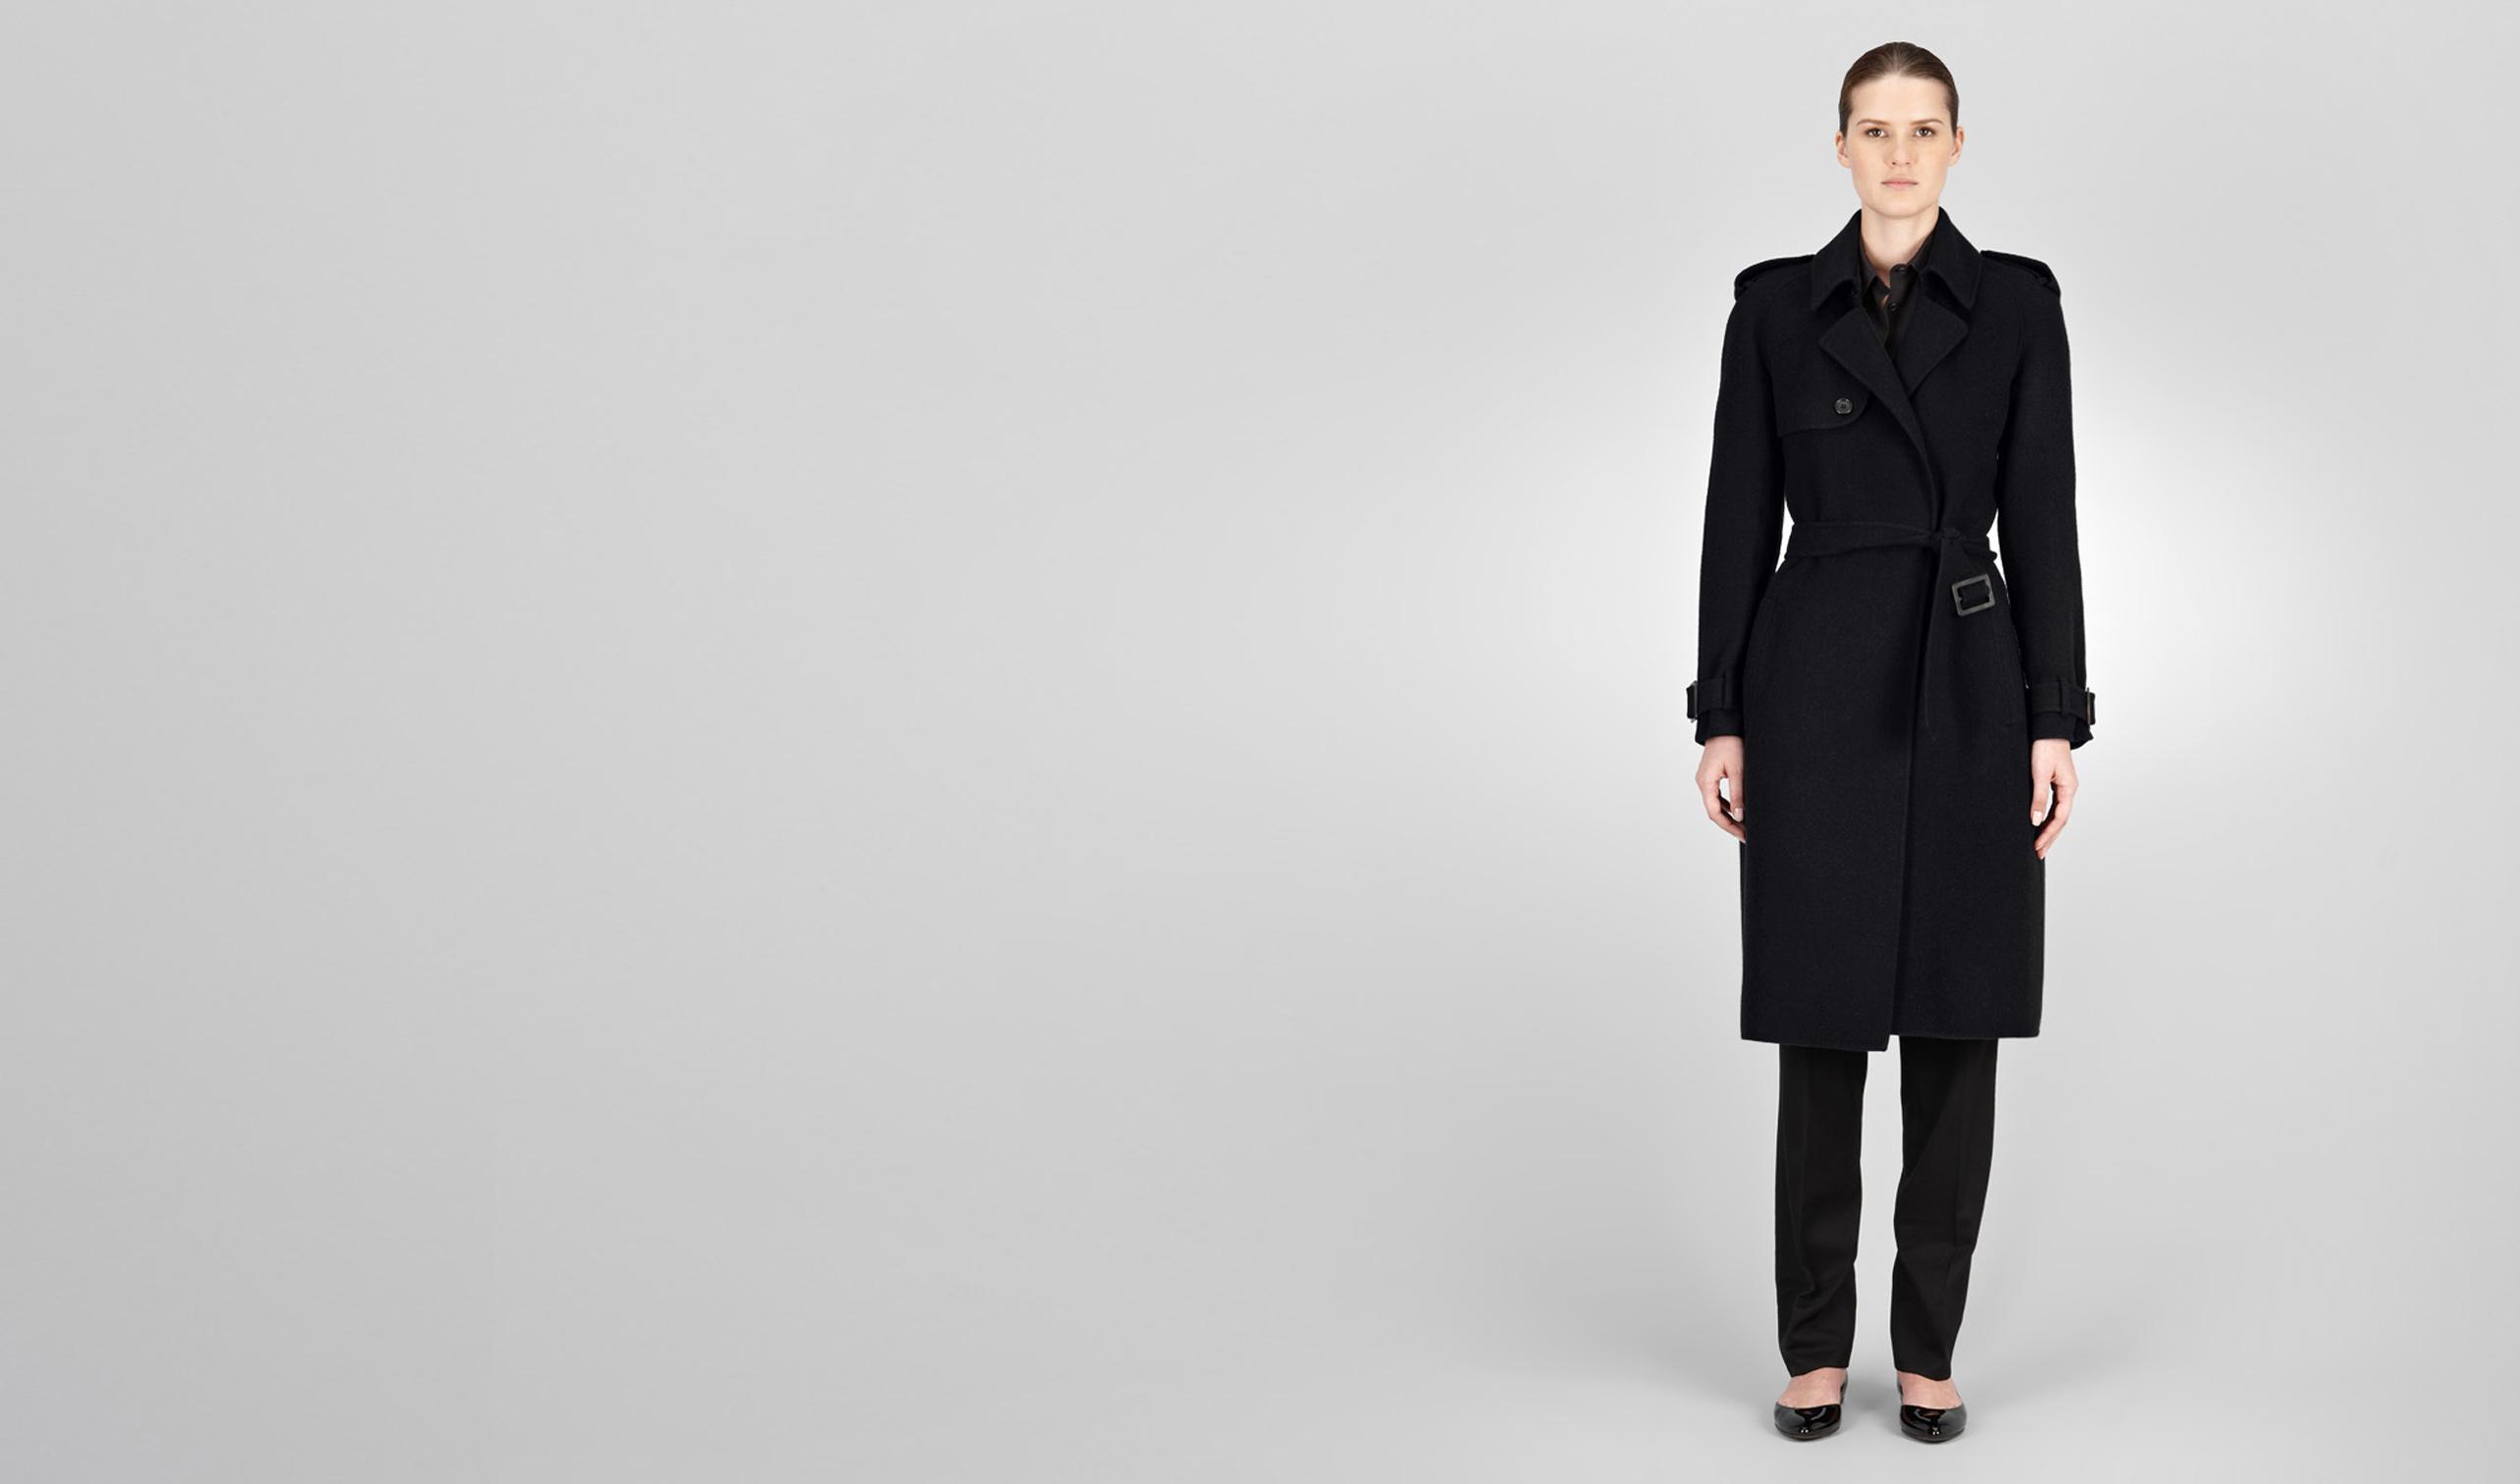 BOTTEGA VENETA Coat or Jacket D TRENCH IN NERO DOUBLE CASHMERE pl